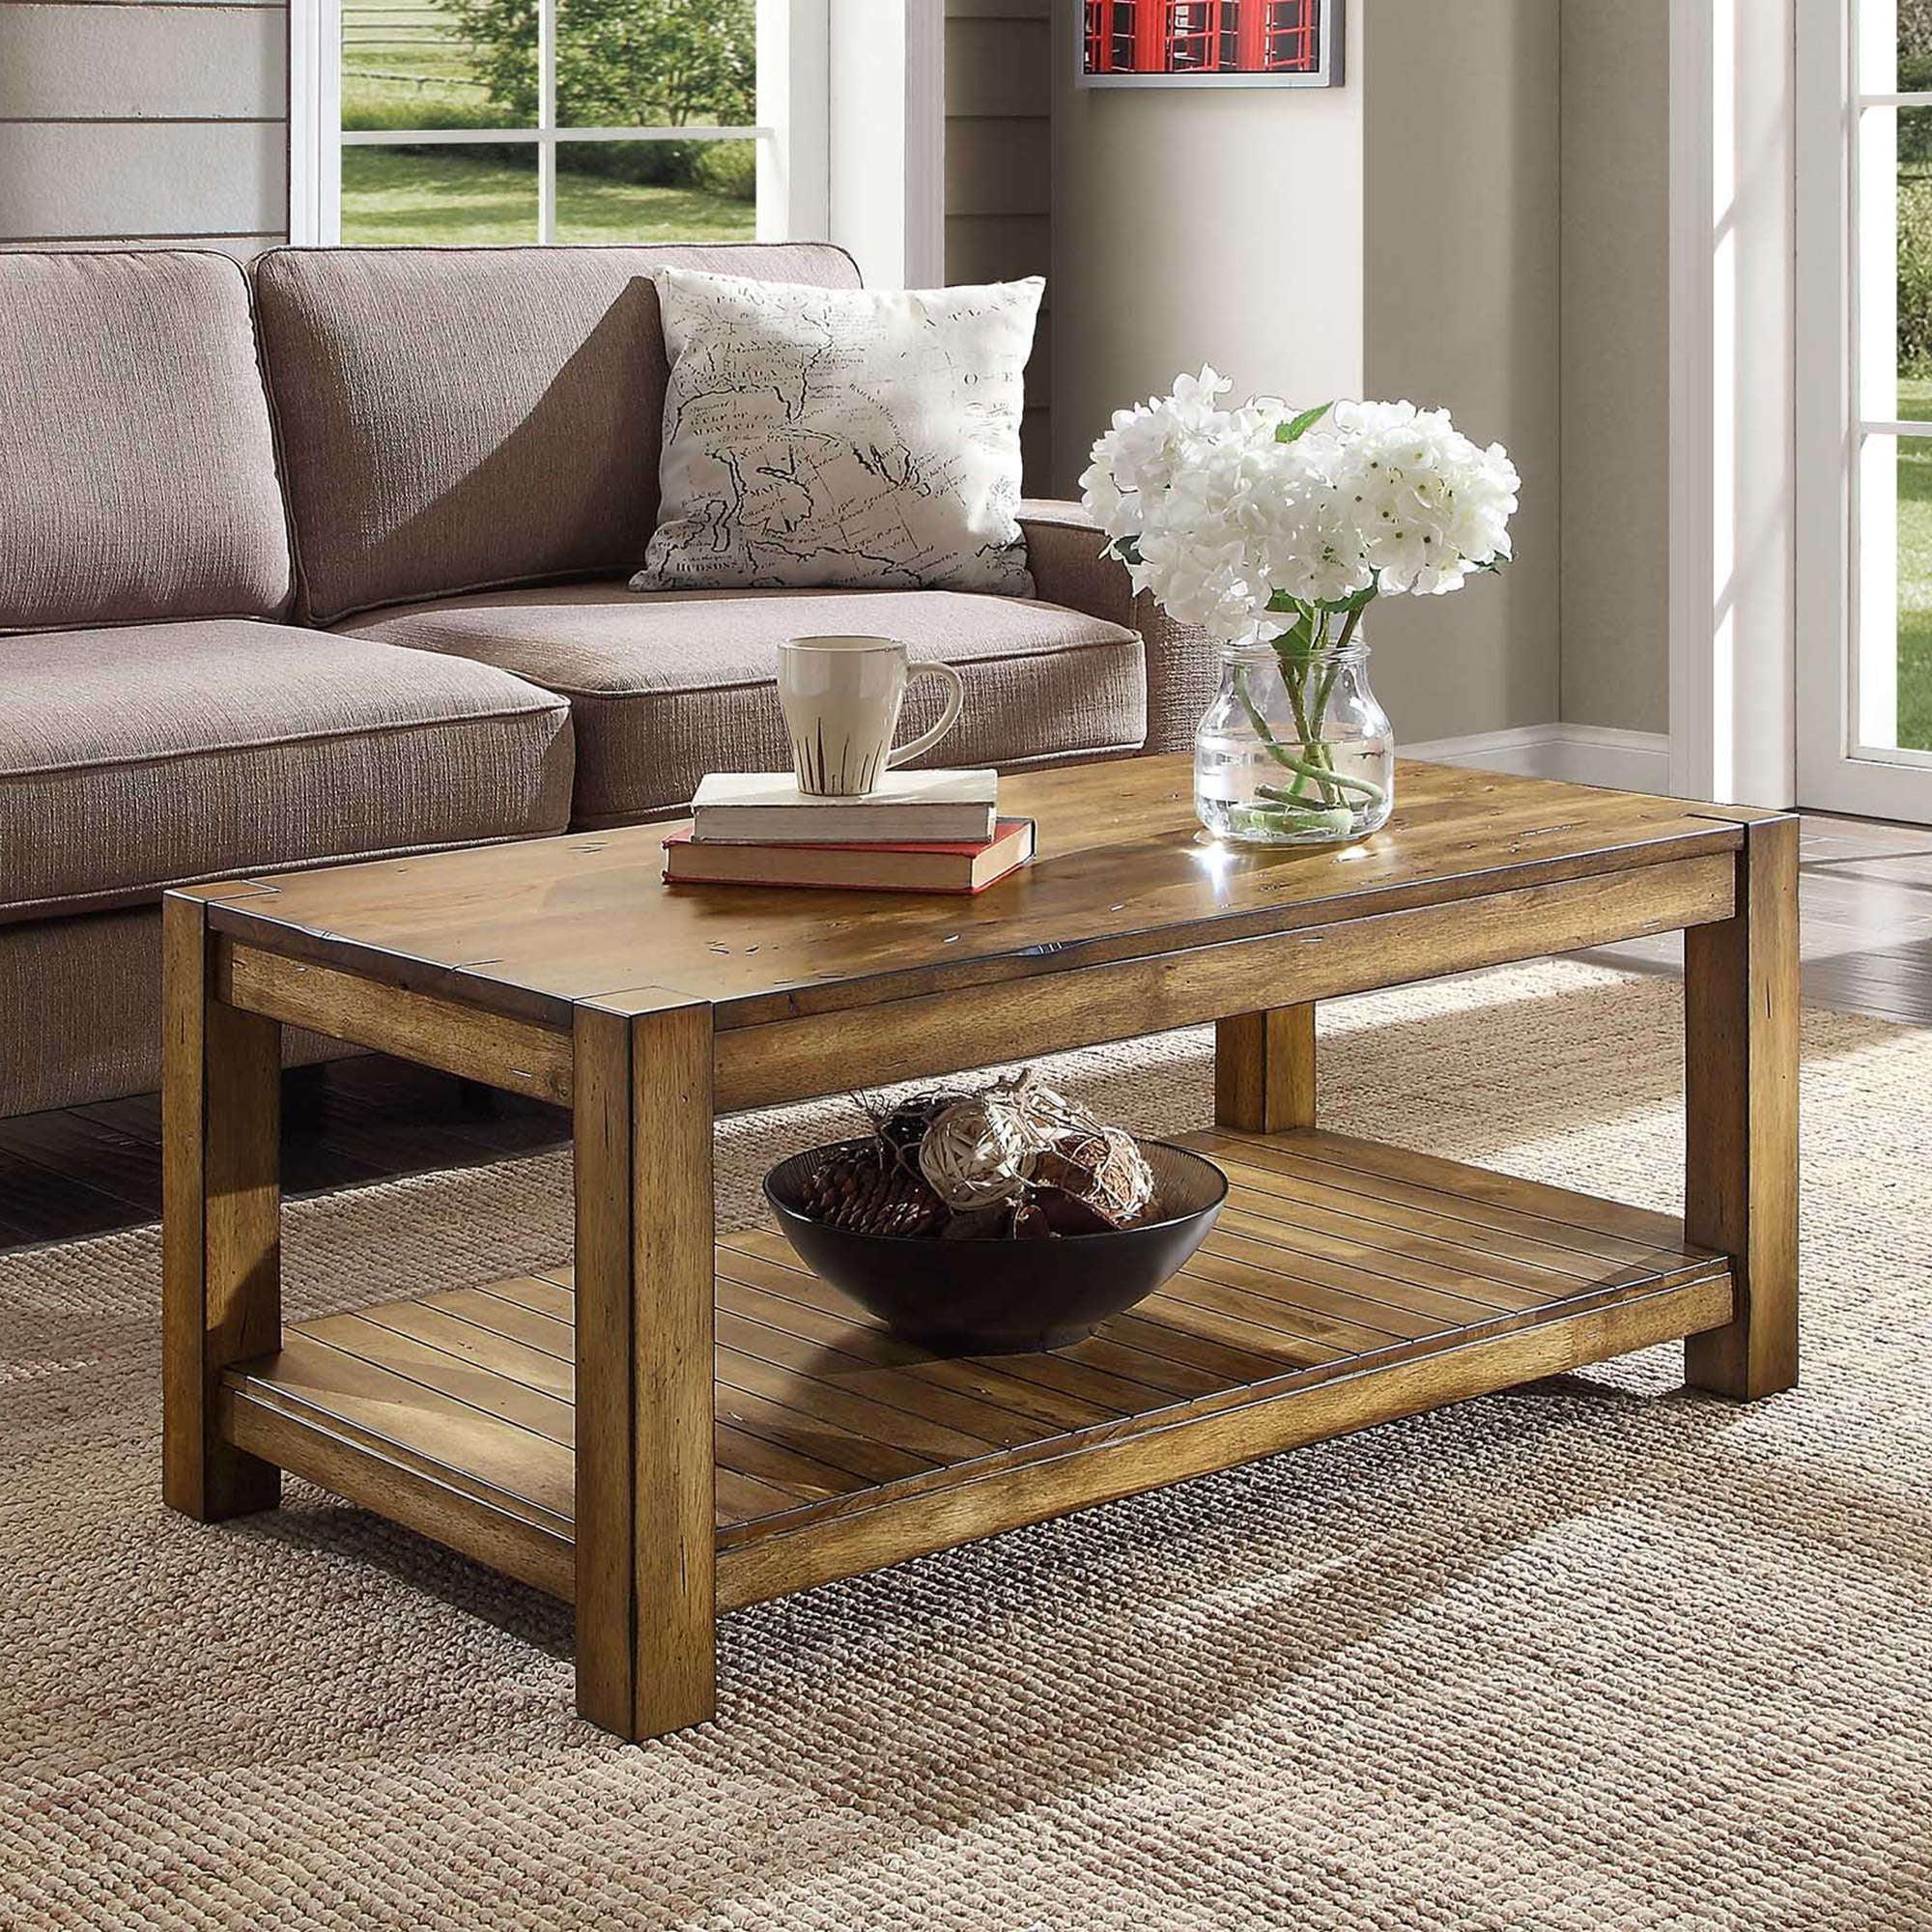 Better Homes Gardens Bryant Solid Wood Coffee Table Rustic Maple Brown Finish Walmart Com Walmart Com